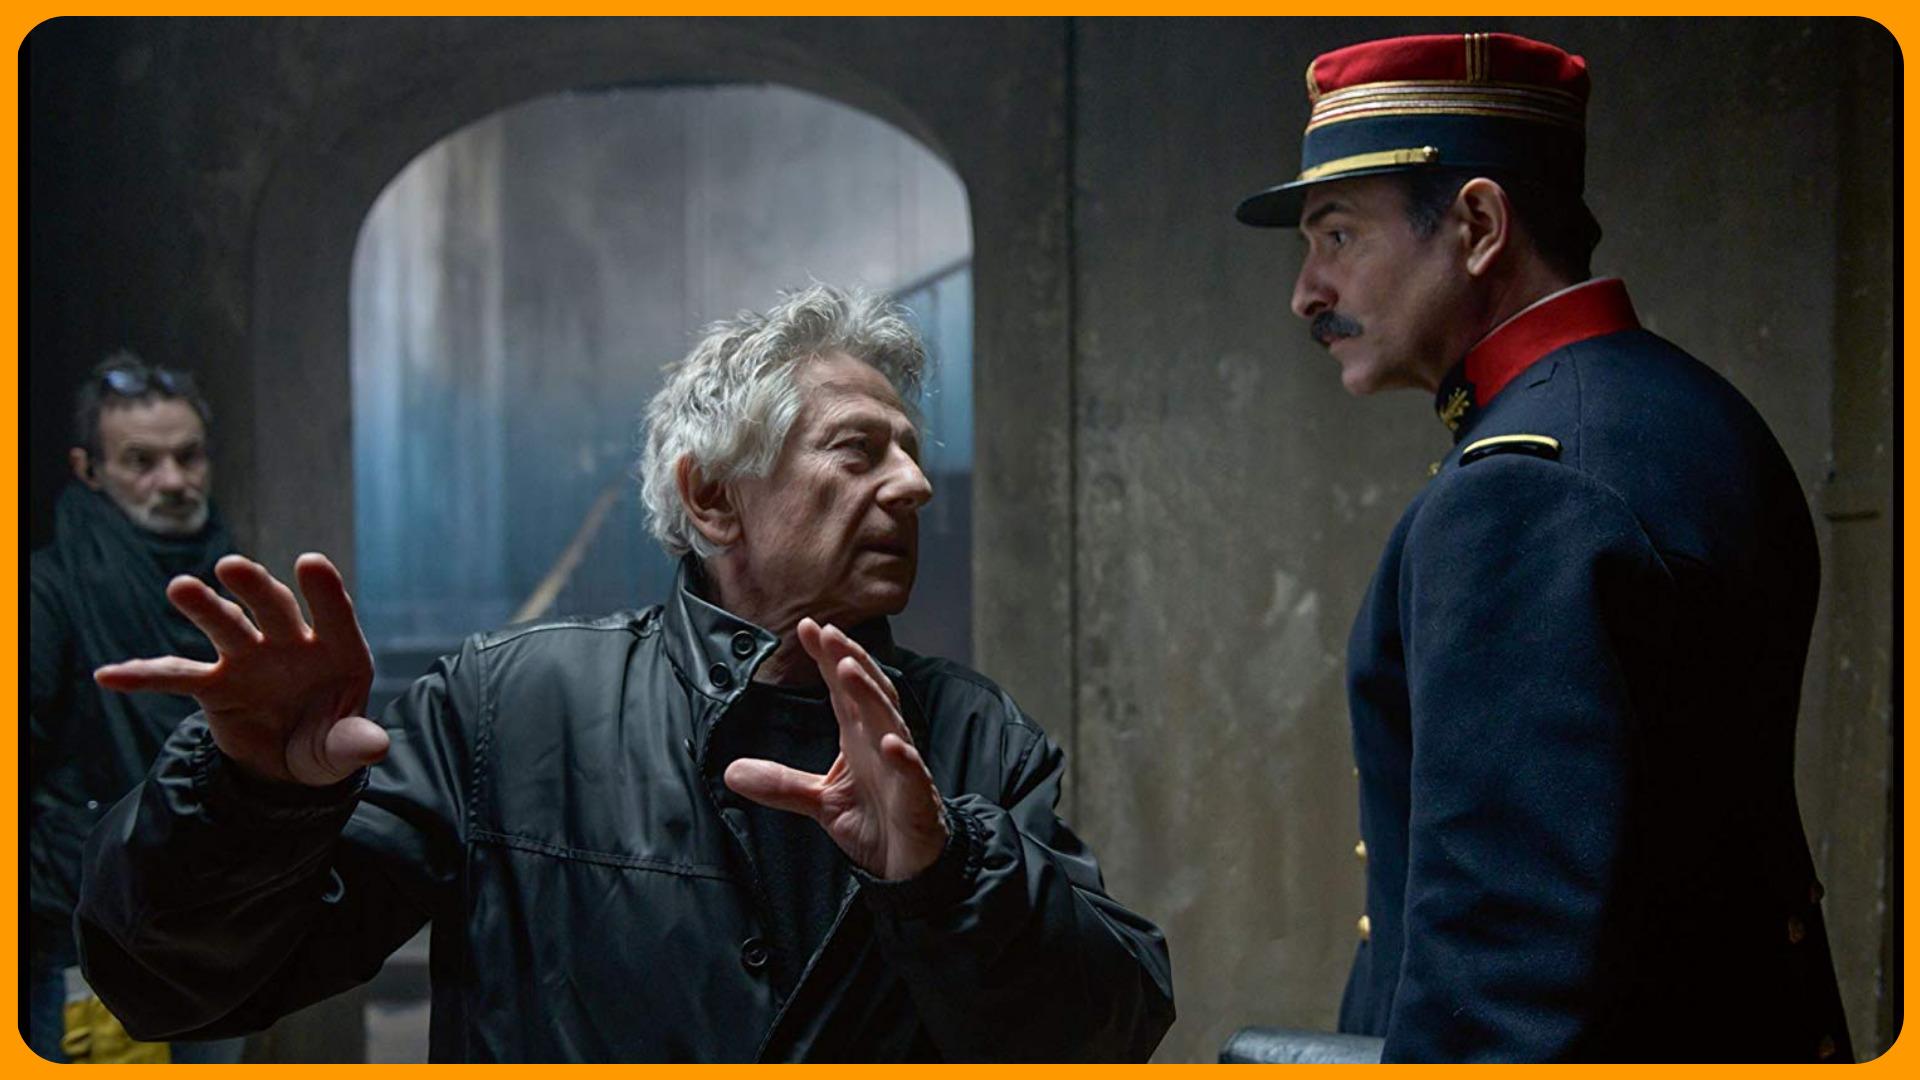 «Офицер и шпион» 2019. Фото со съёмок, в центре - режиссёр Роман Полански